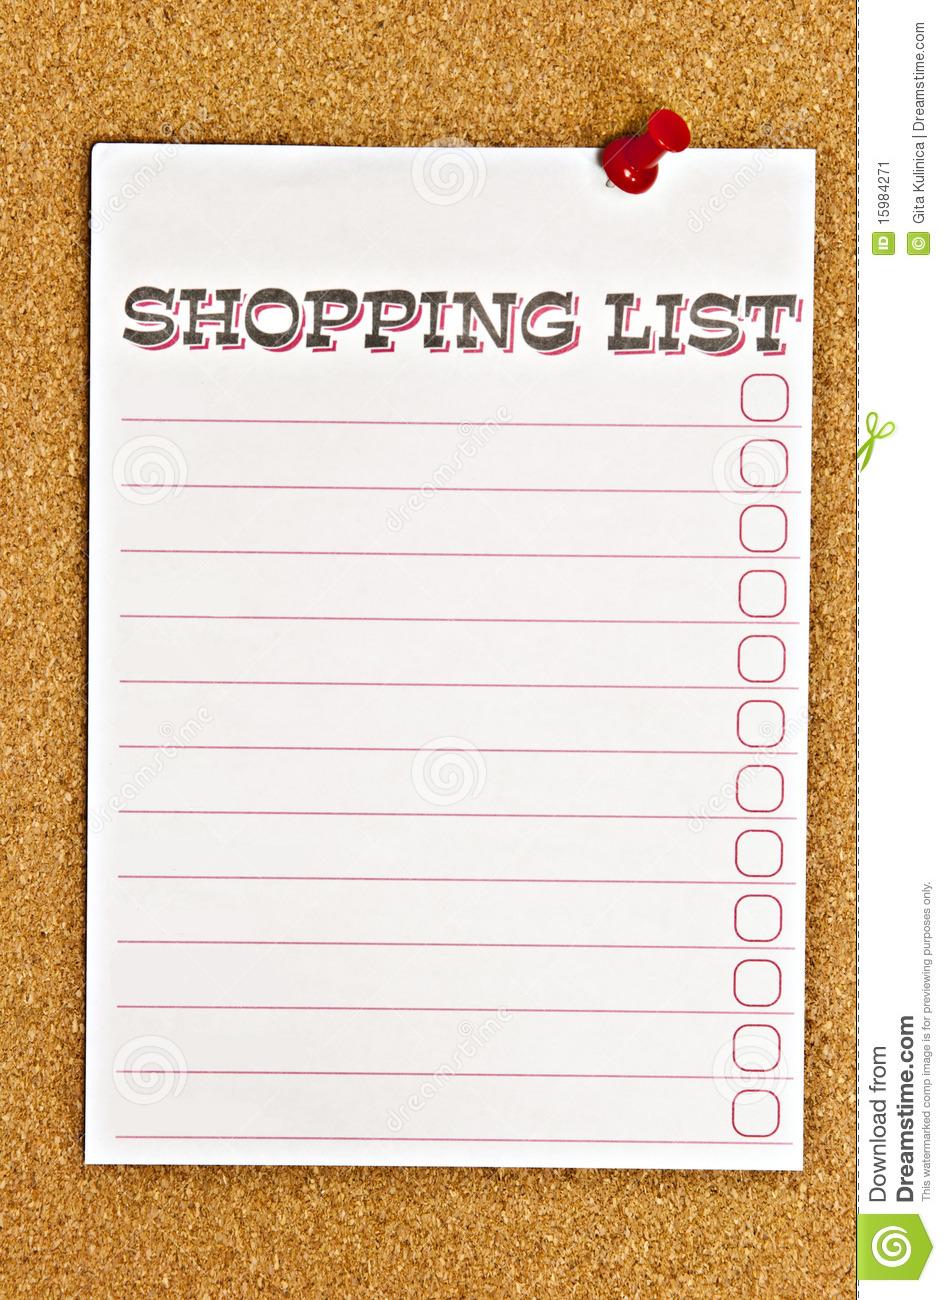 Shopping list clip art.